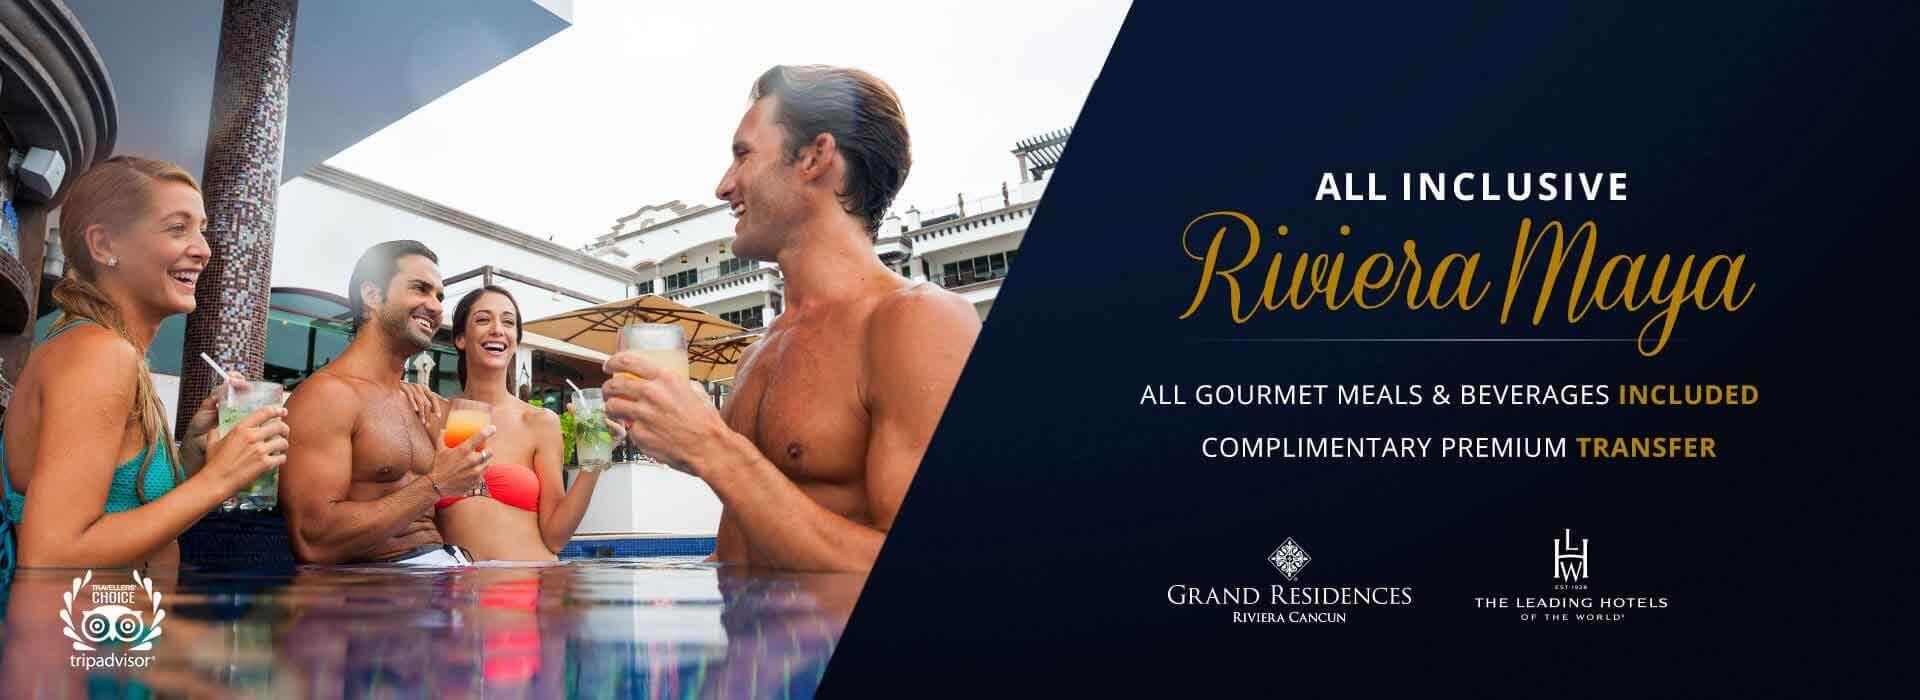 all inclusive hotel riviera maya